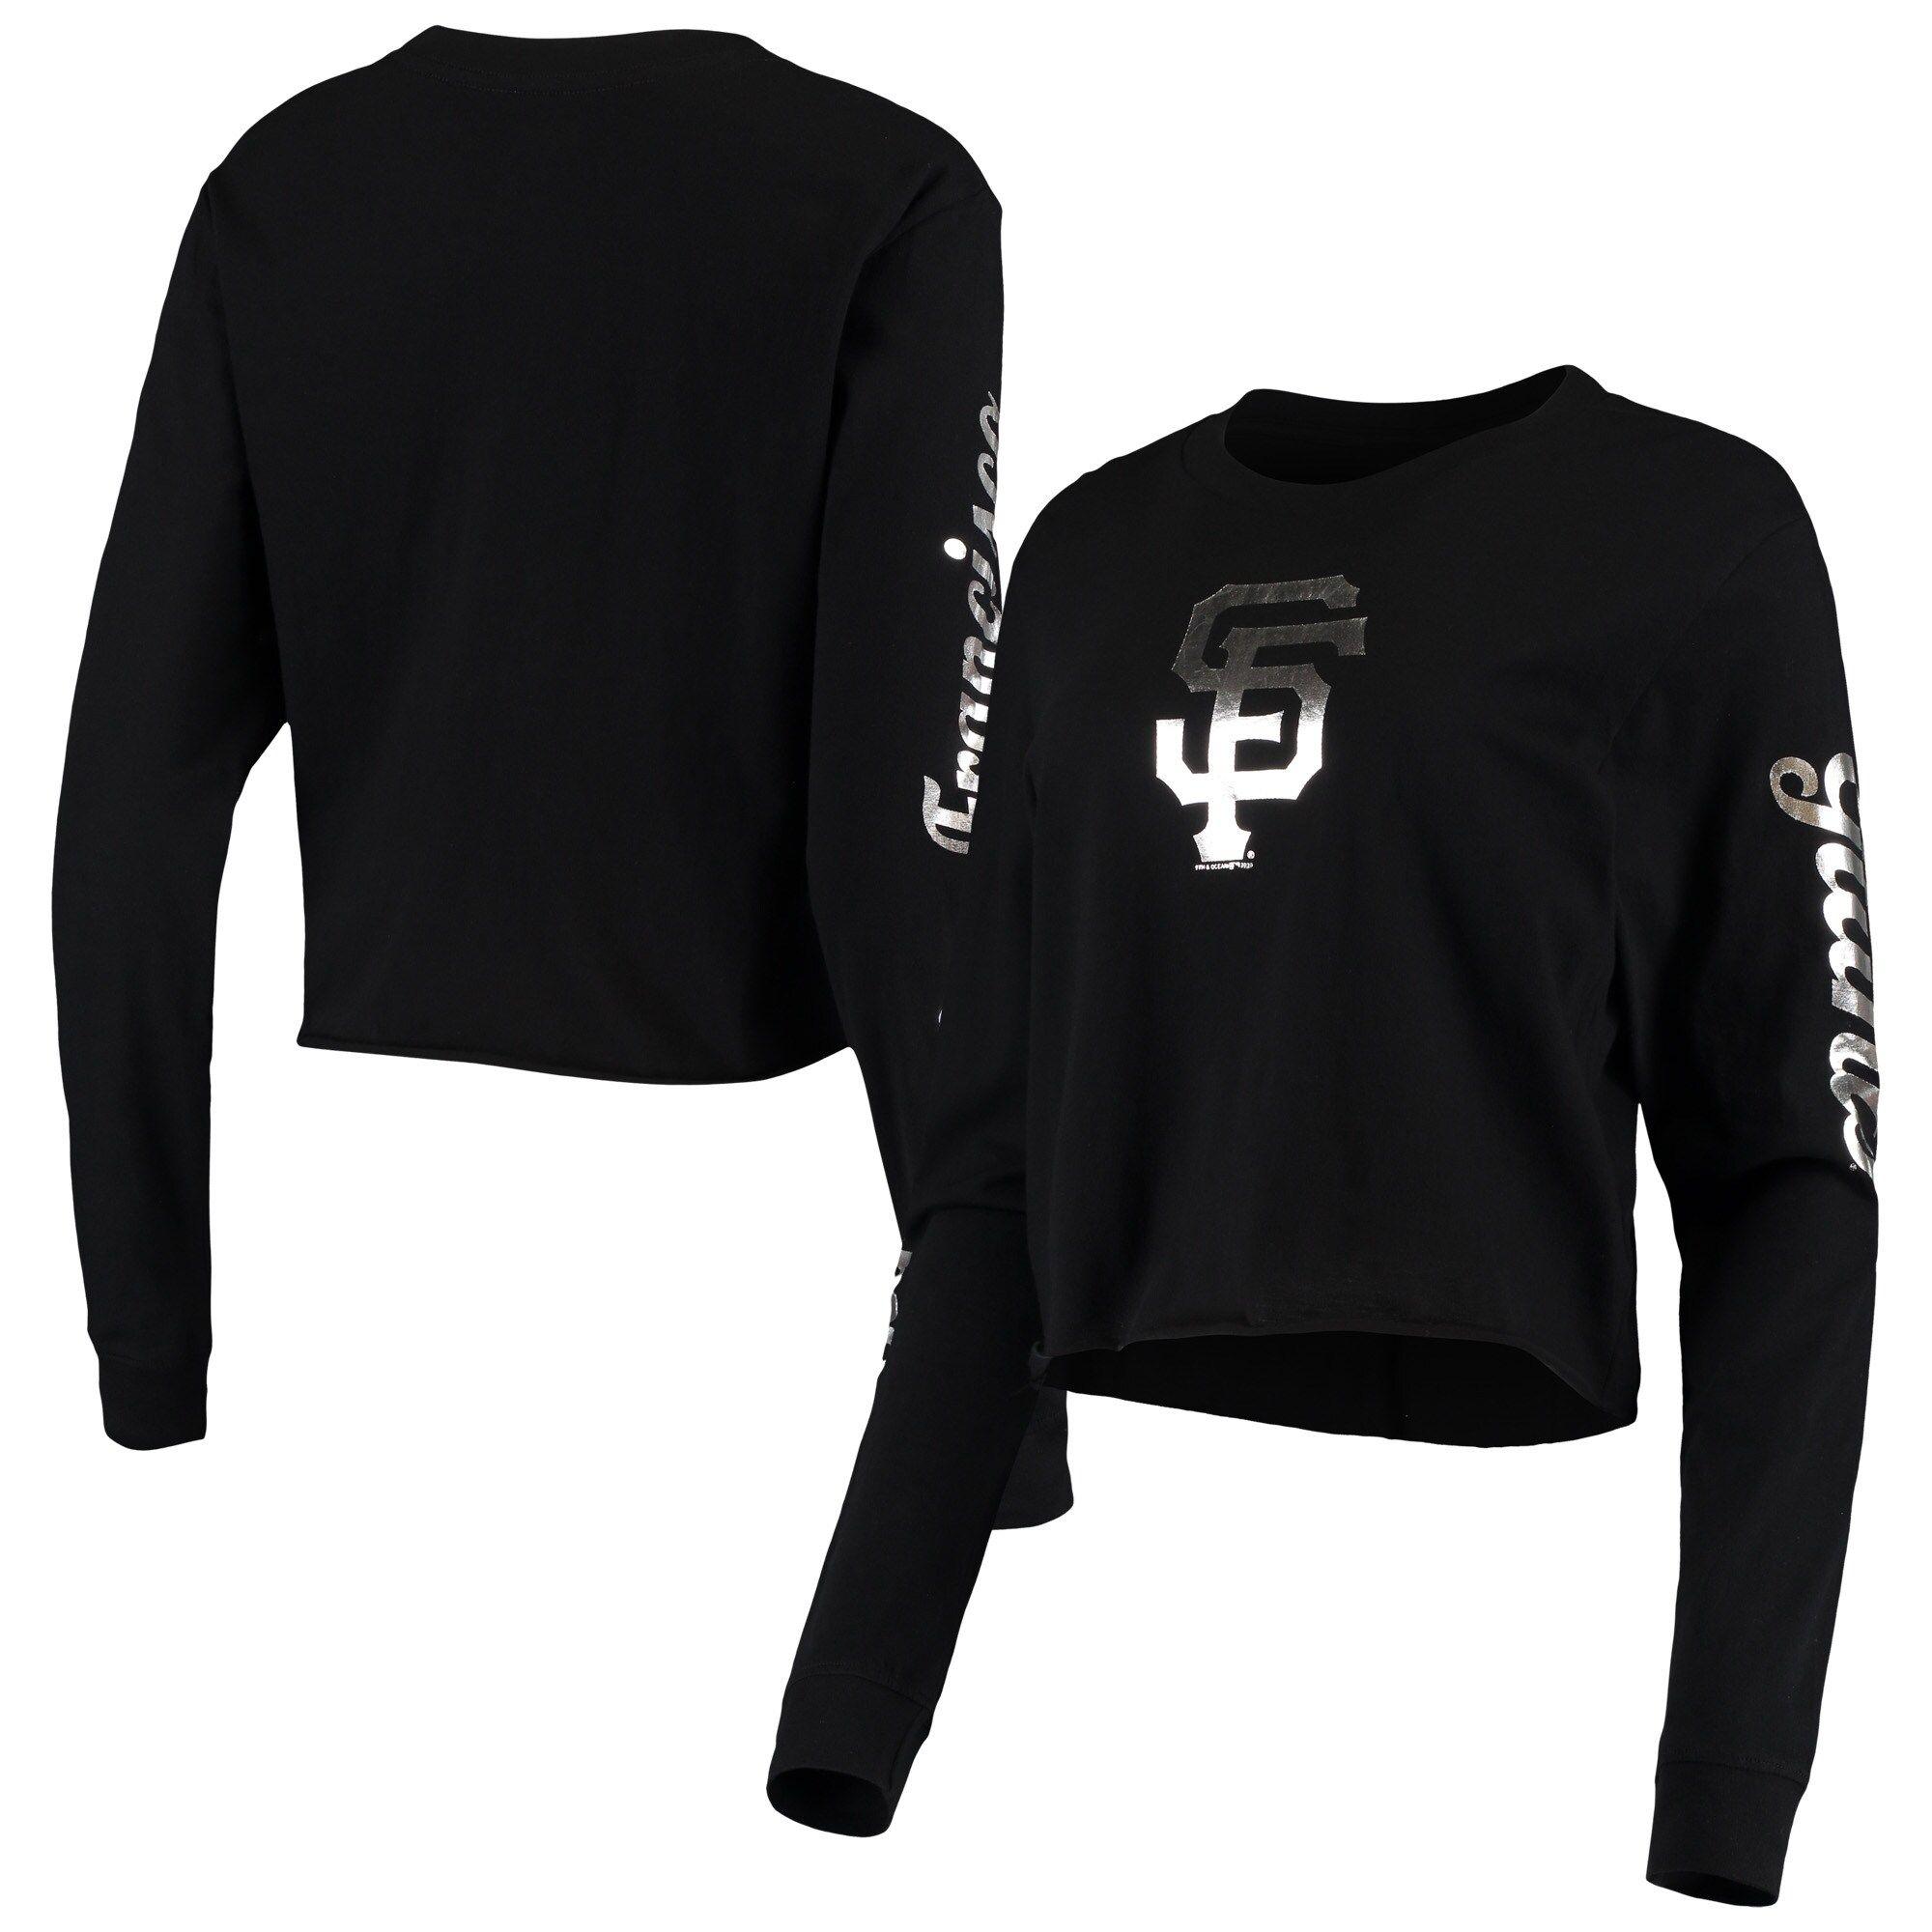 Predownload: Women S San Francisco Giants New Era Black Baby Jersey Long Sleeve Cropped T Shirt Crop Tshirt San Francisco Giants Black Shirt [ 2000 x 2000 Pixel ]